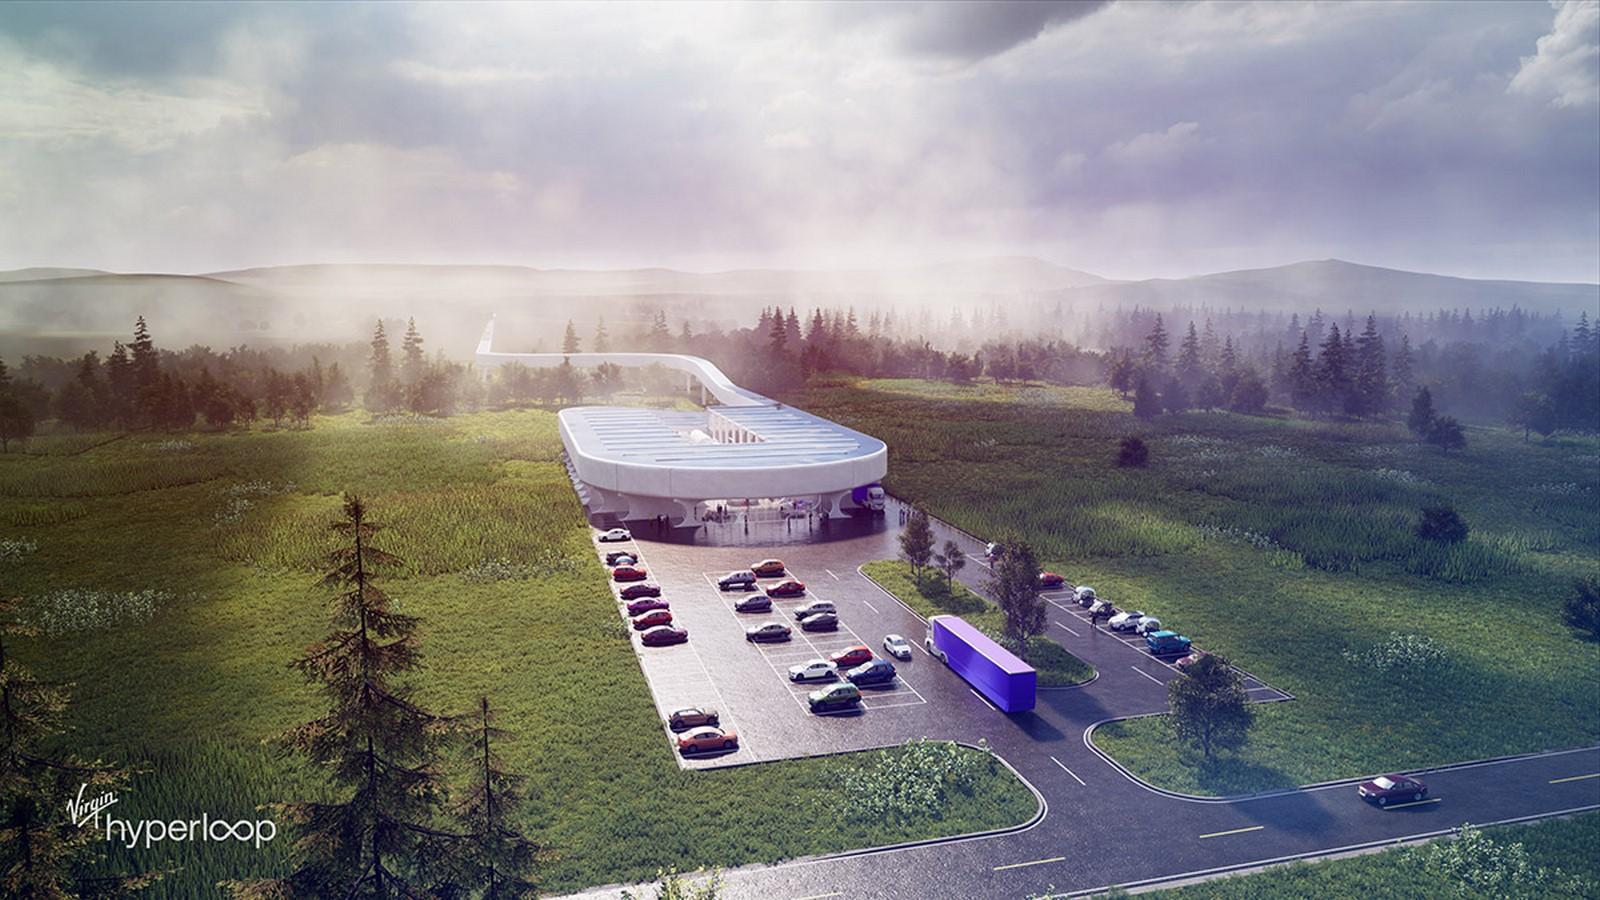 Virgin Hyperloop Certification Center for West Virginia designs revealed by BIG - Sheet1